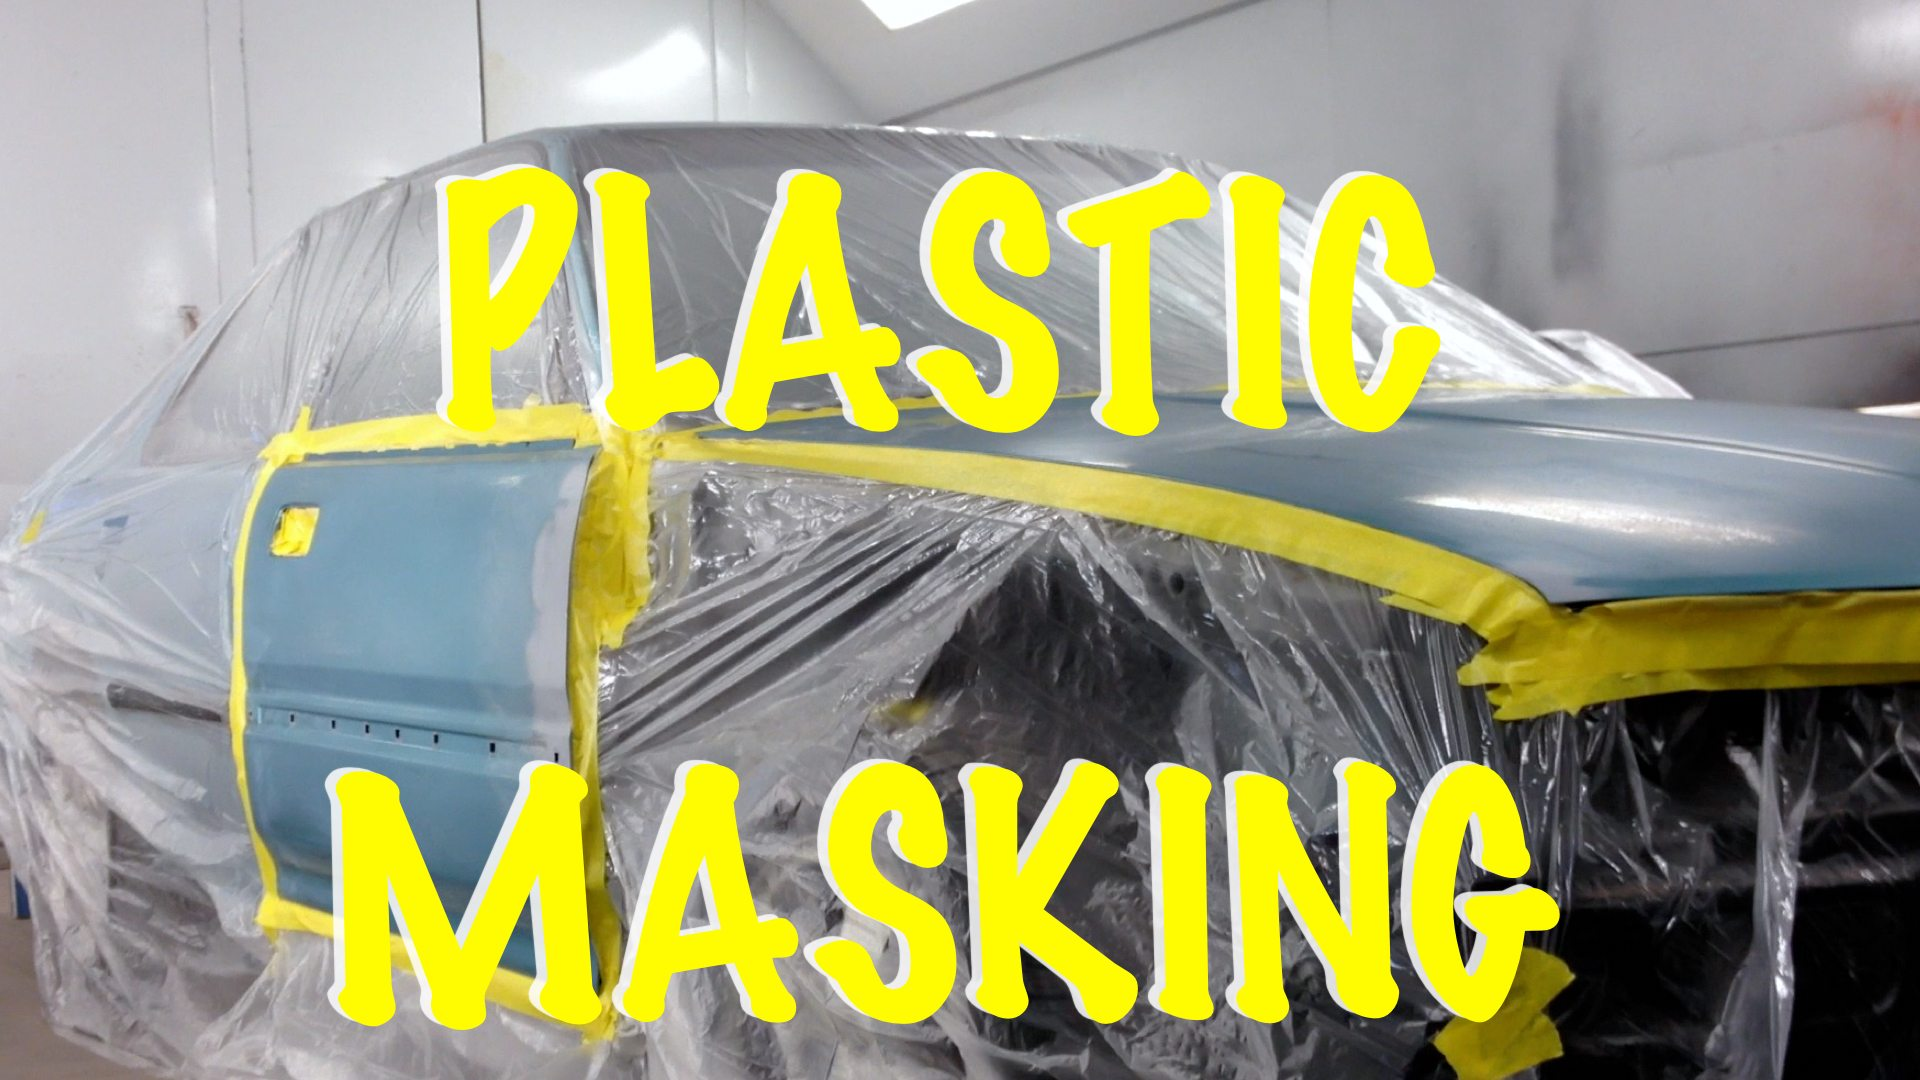 plastic-masking-pic-001